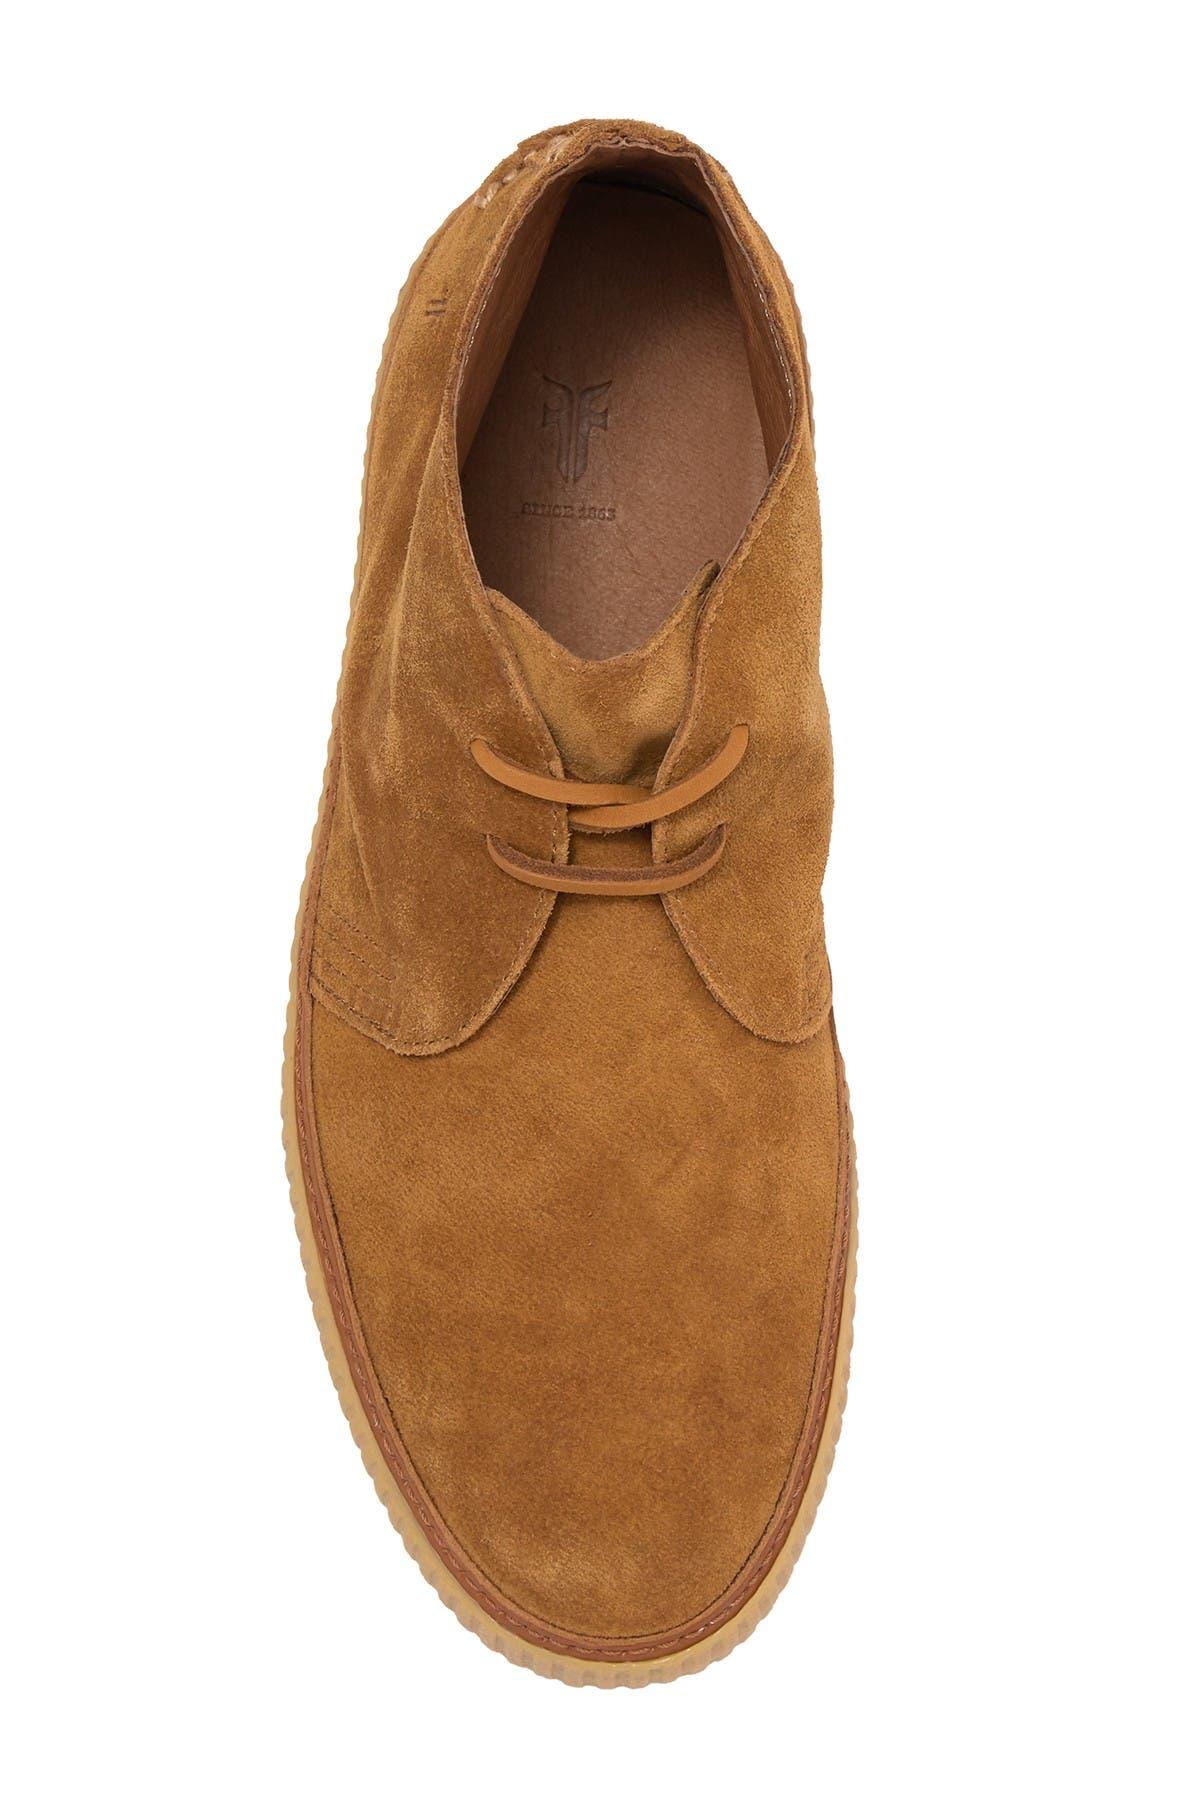 Frye Mens Emory Chukka Chukkas Boots Boots